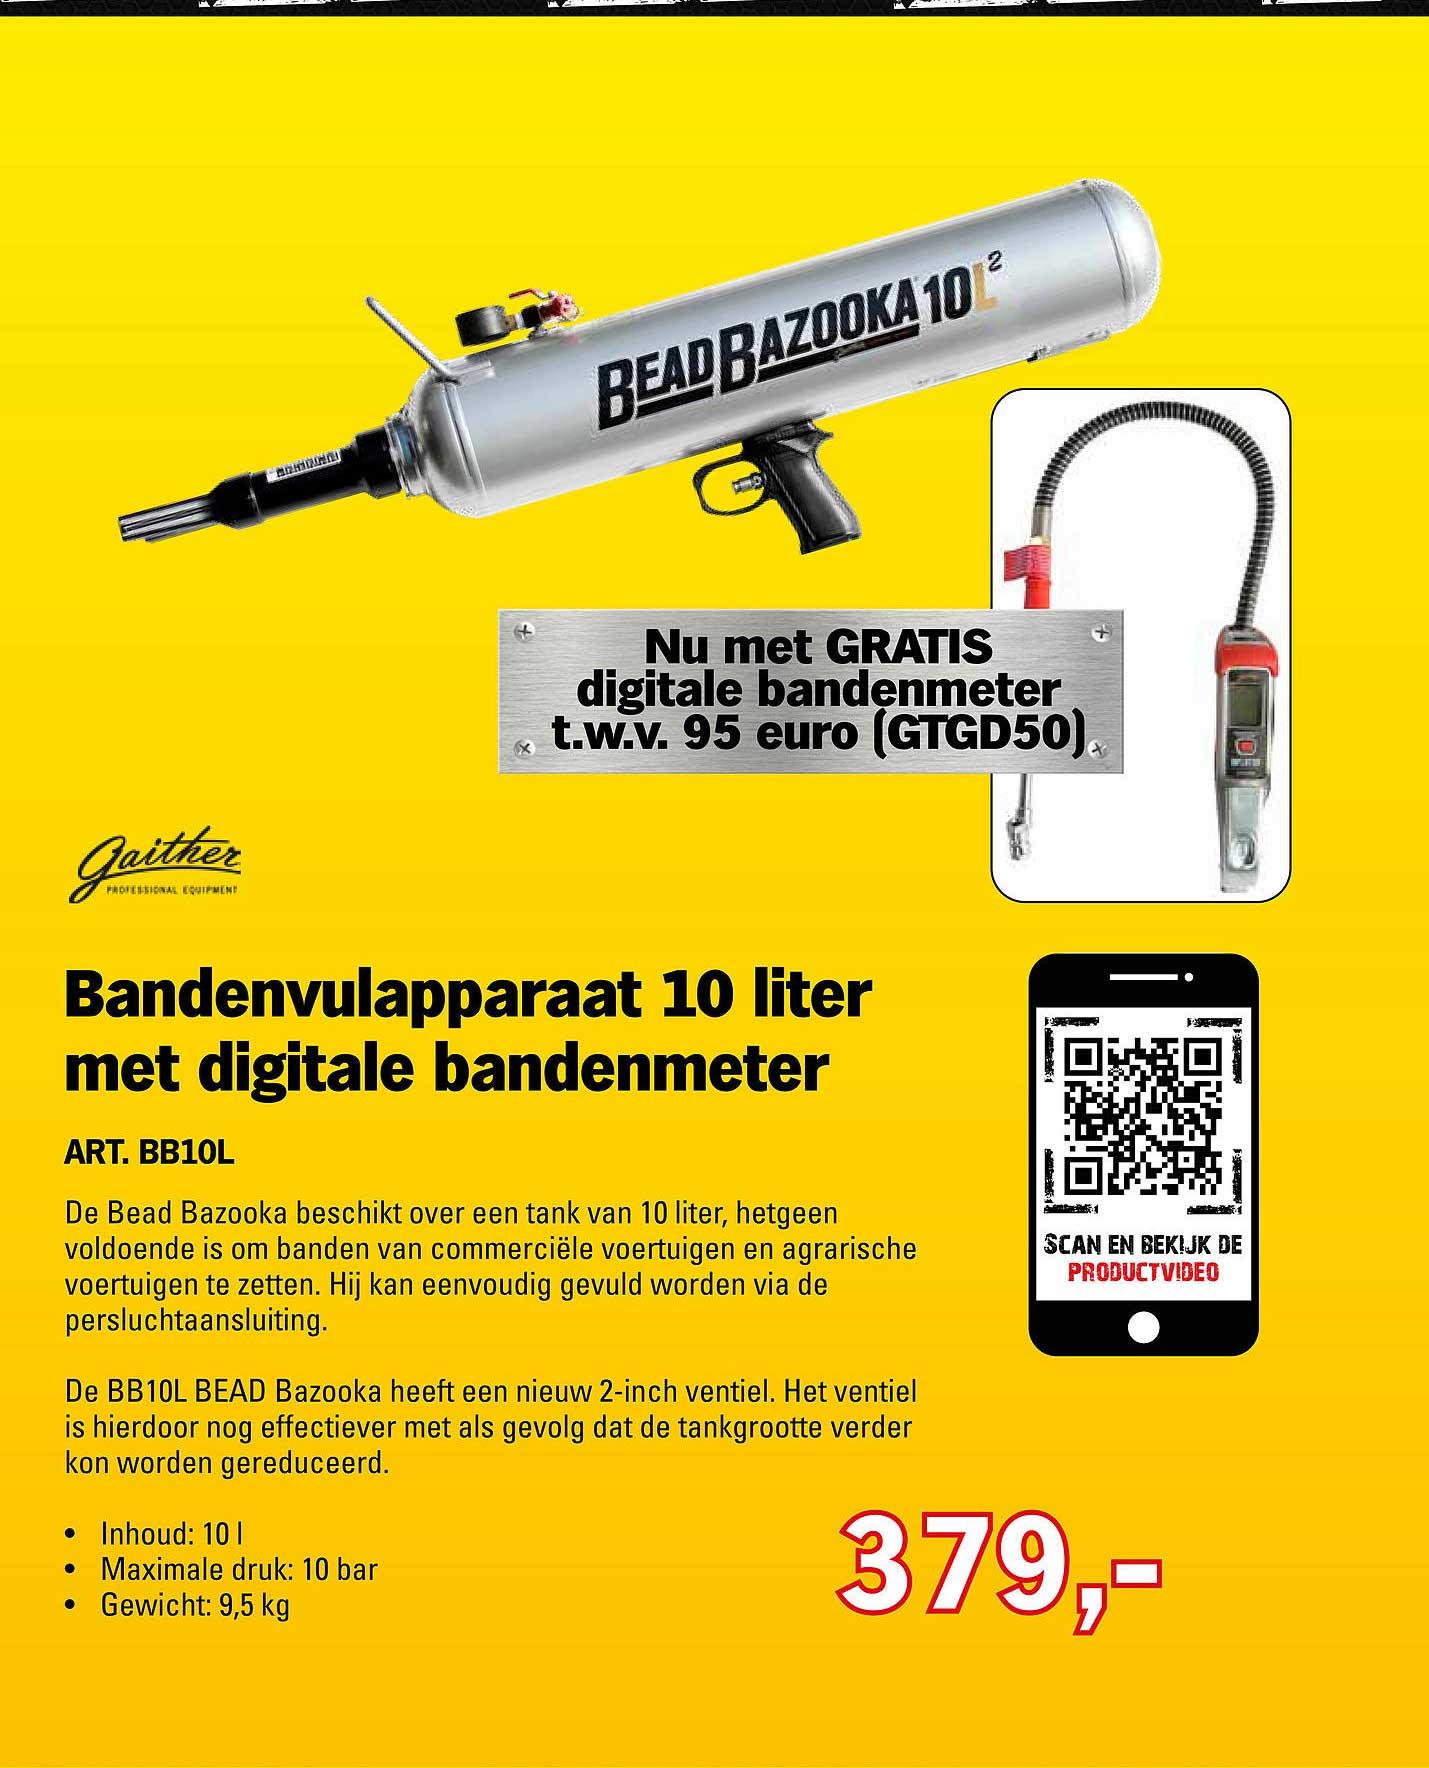 Toolspecial Gaither Bandenvulapparaat 10 Liter Met Digitale Bandenmeter